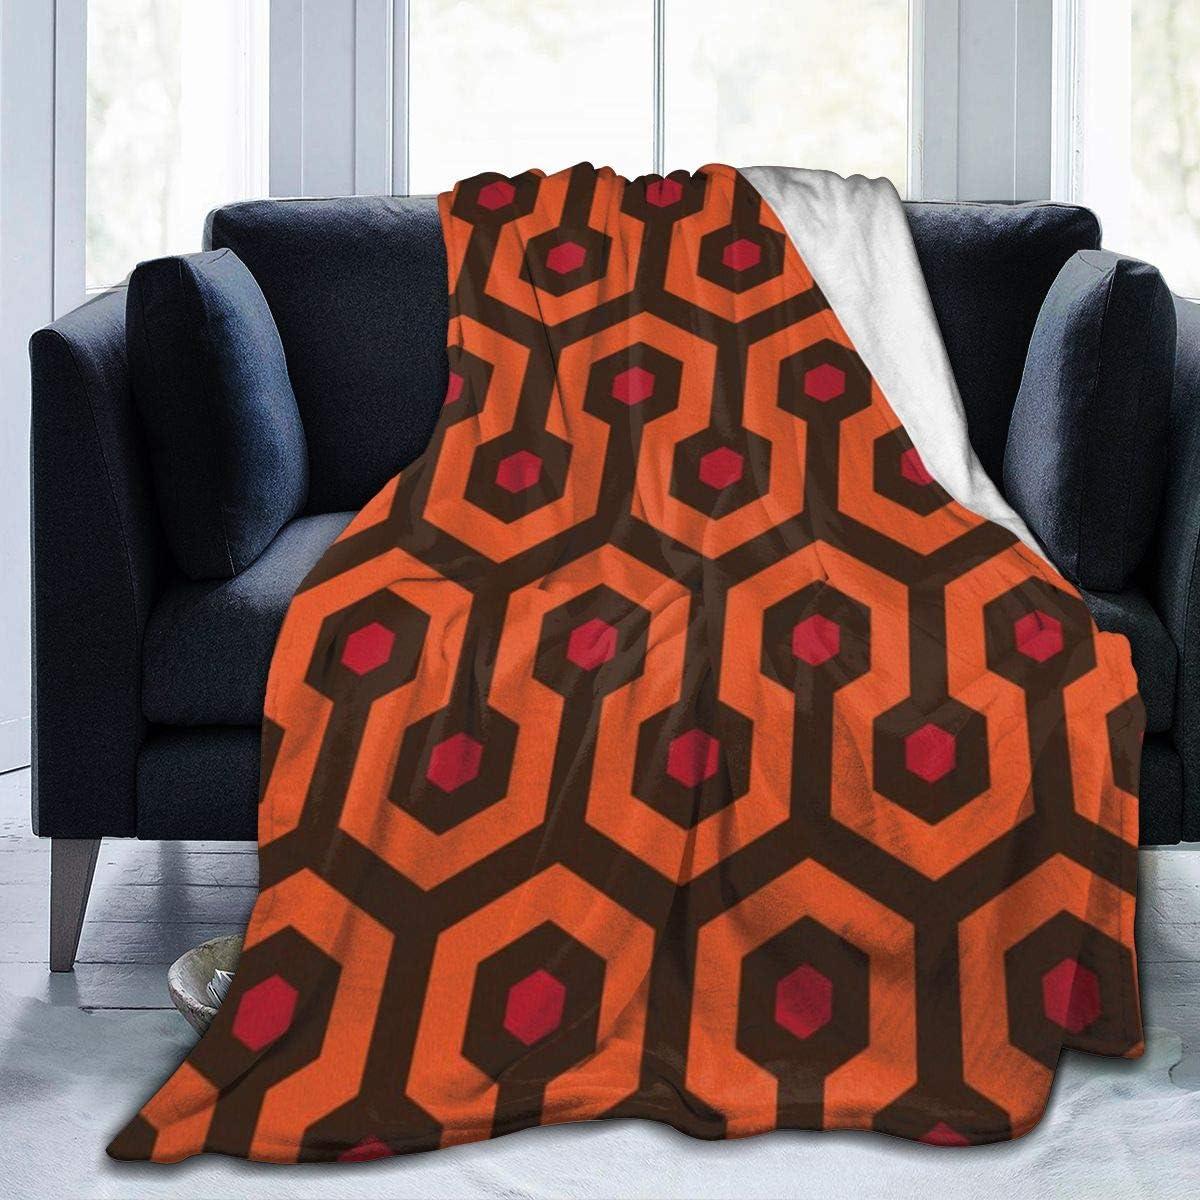 Overlook Hotel Carpet Flannel Fleece Throw Blanket, Soft Warm Cozy Lightweight Kids Toddler Pet Blanket for Sofa Bed Office Adult's Shoulder & Lap, 50x40 Inches